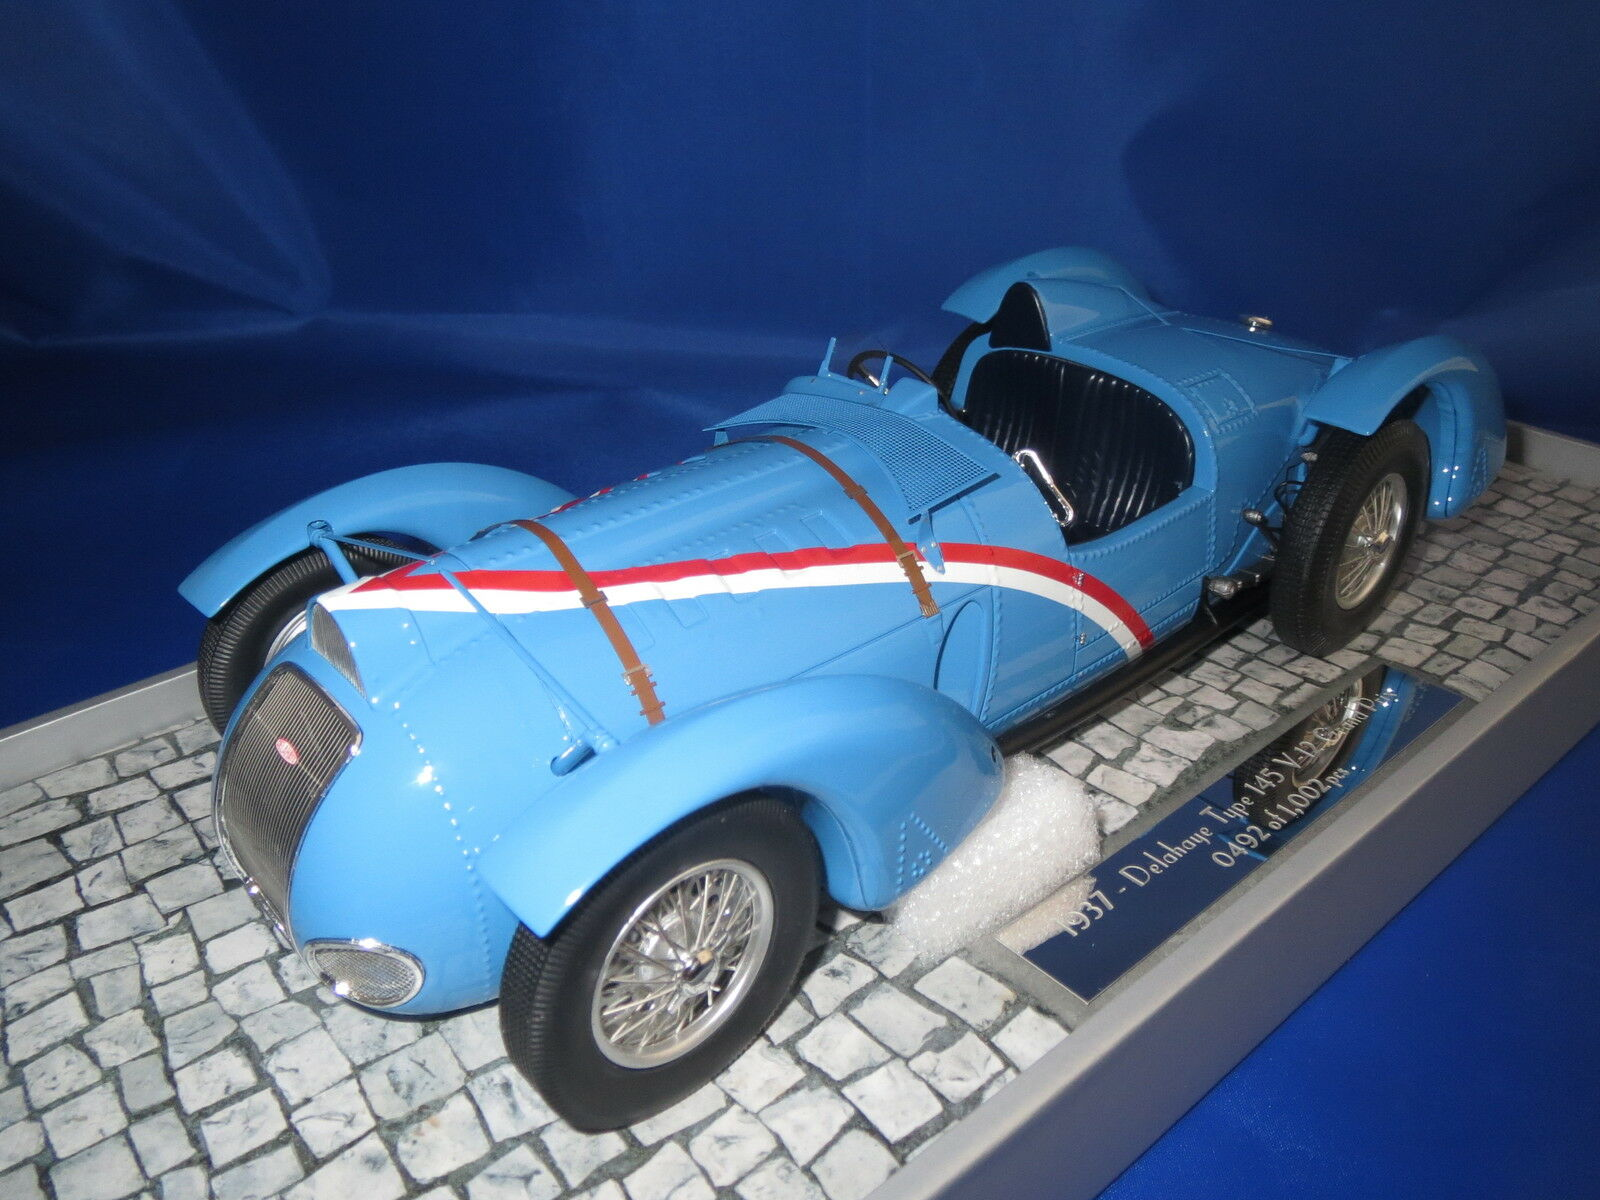 Minichamps 1937 Delahaye type 145 v-12 grand prix berline 1002 pc (bleu) 1 18 OVP